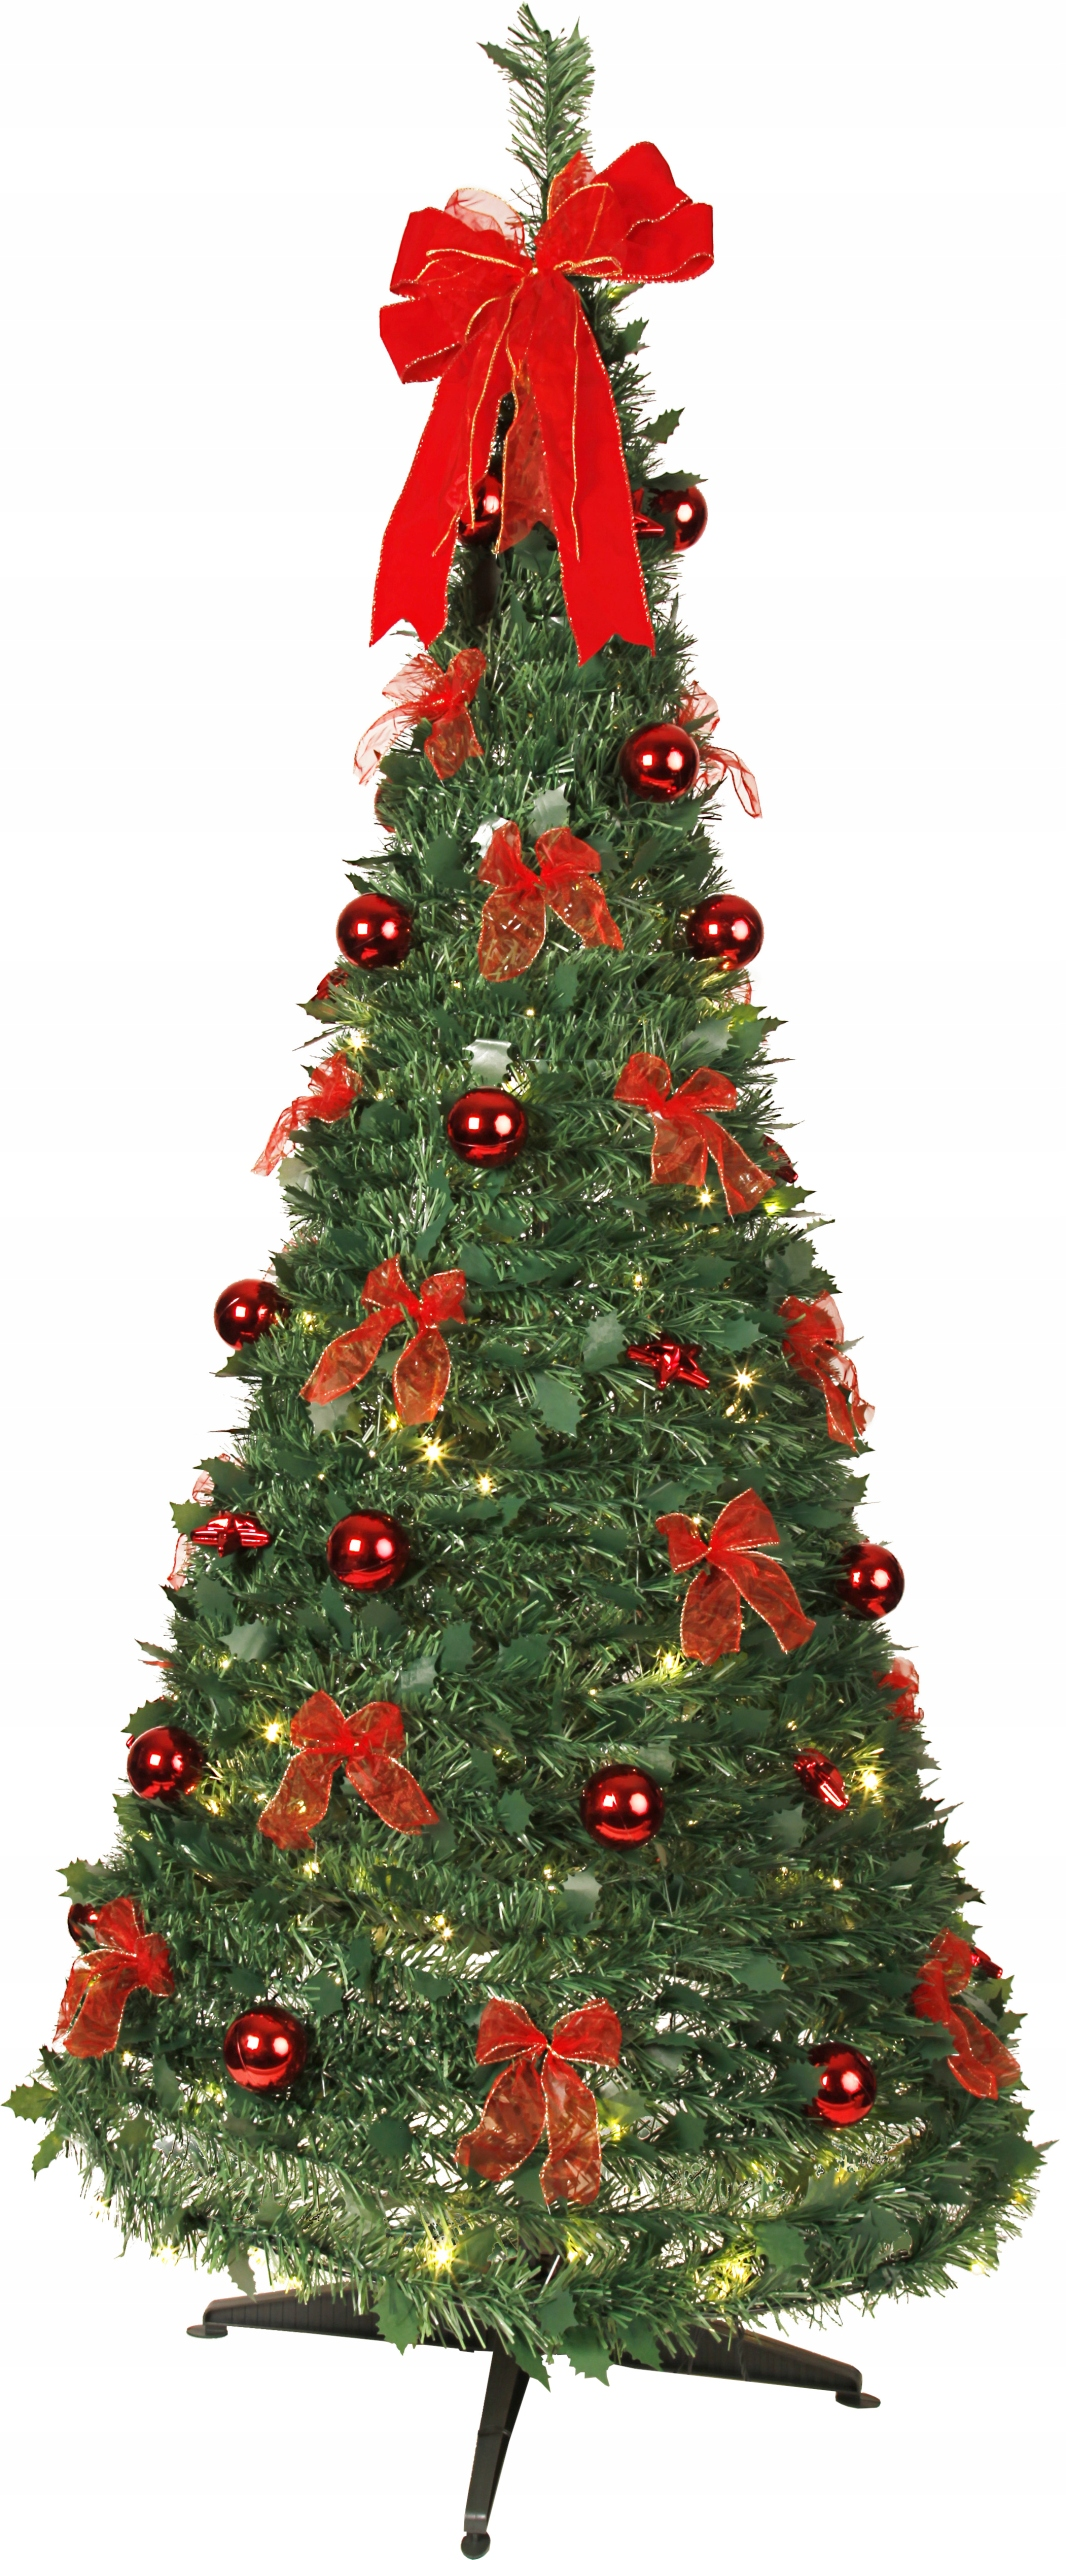 Vianočný stromček KUŽEL 185 cm zdobený osvetlením